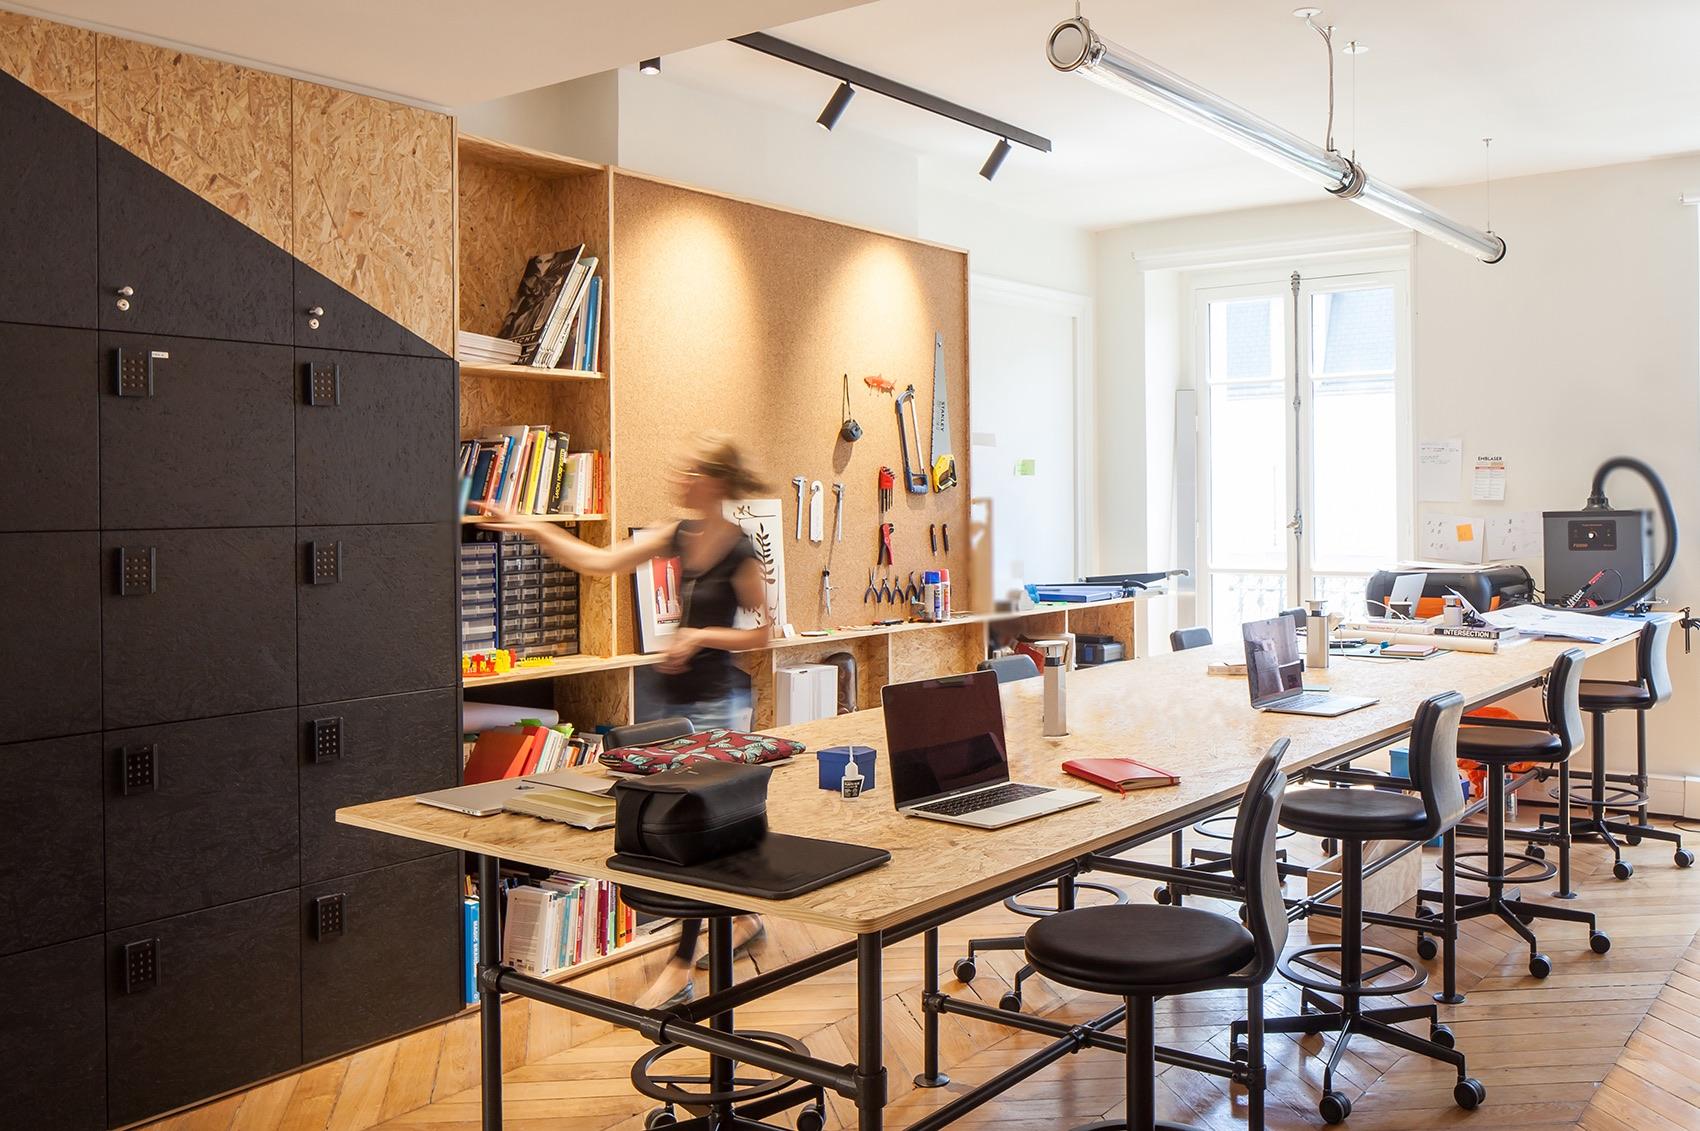 pwc-paris-office-8